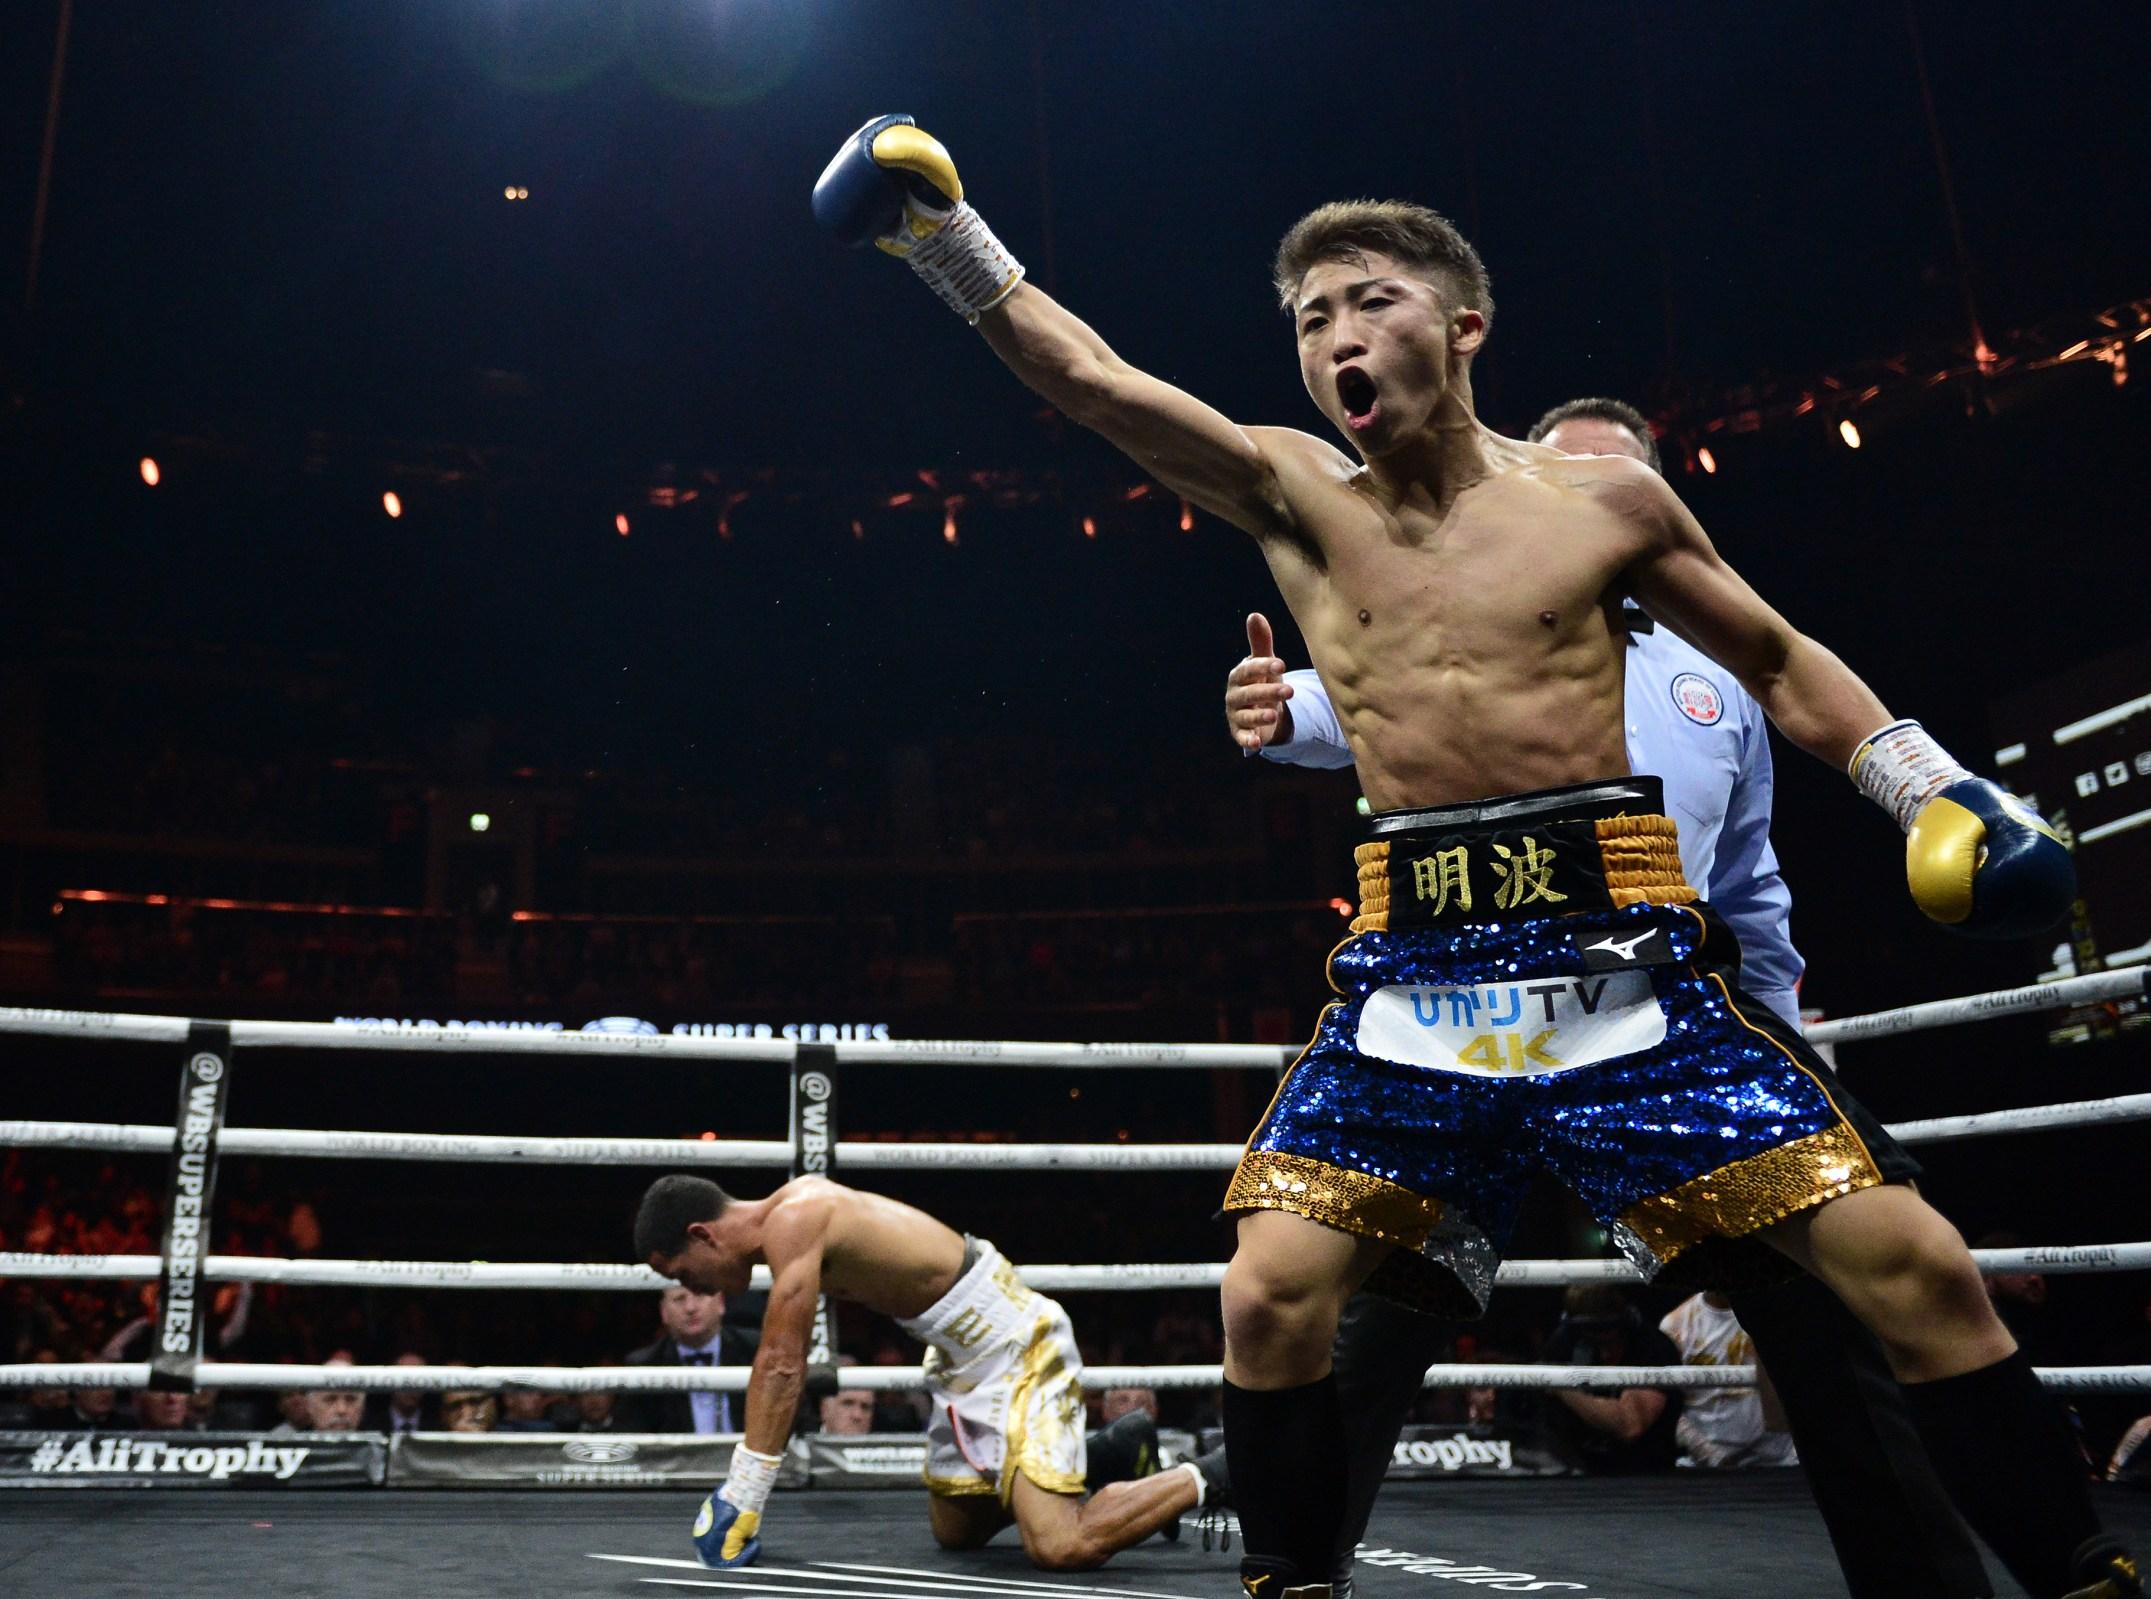 Naoya Inoue celebrates as he knocks down Emmanuel Rodriguez